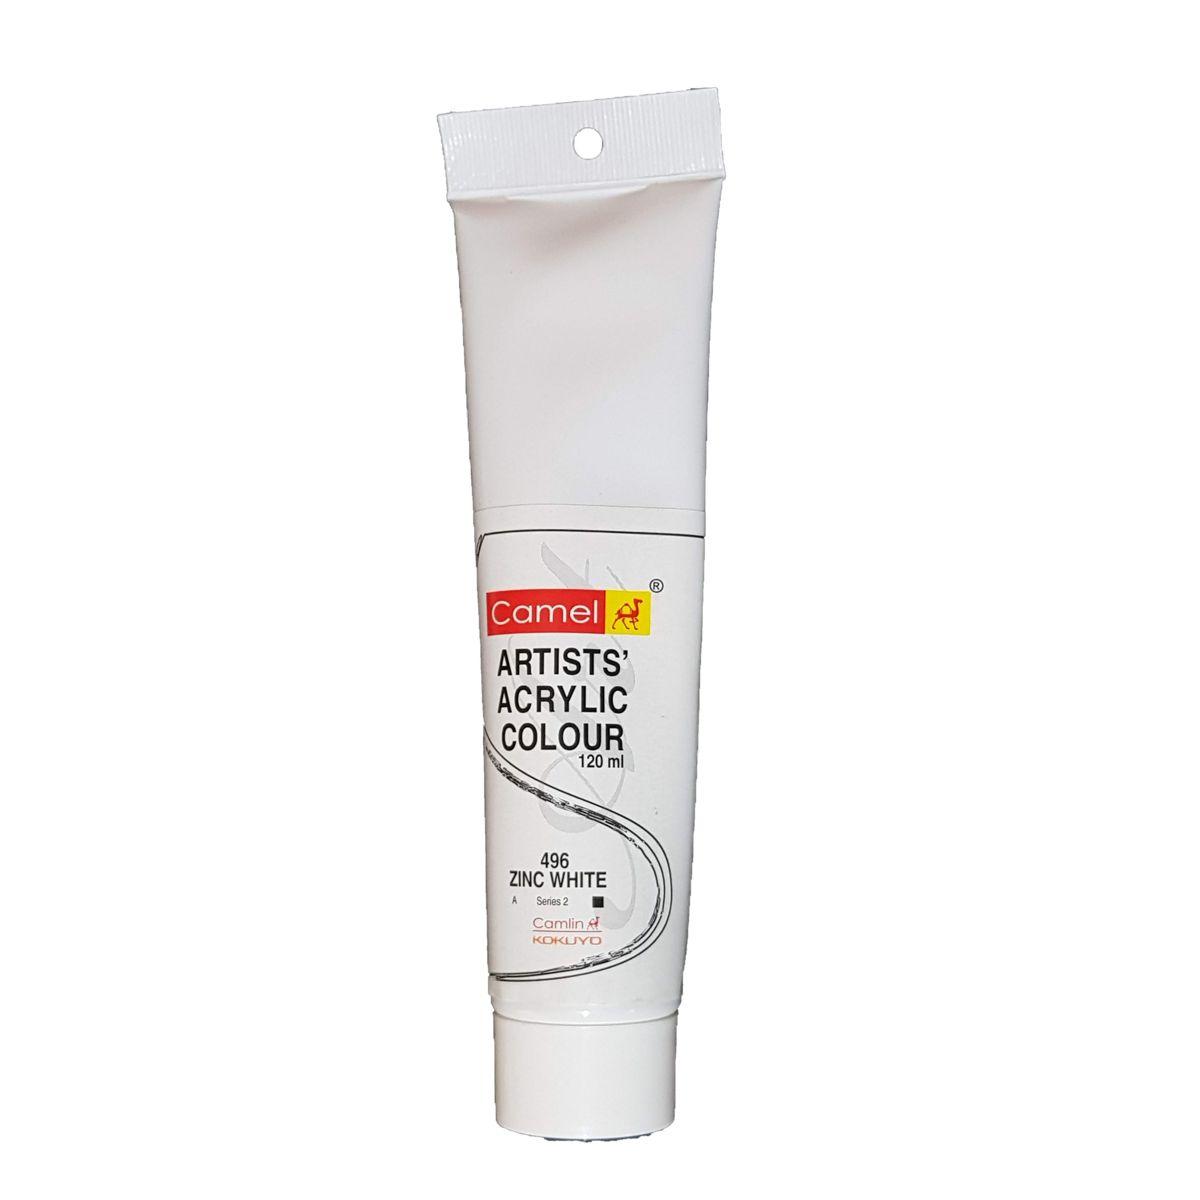 Camlin Artist Acrylic Colour 120ml  Zinc White 496